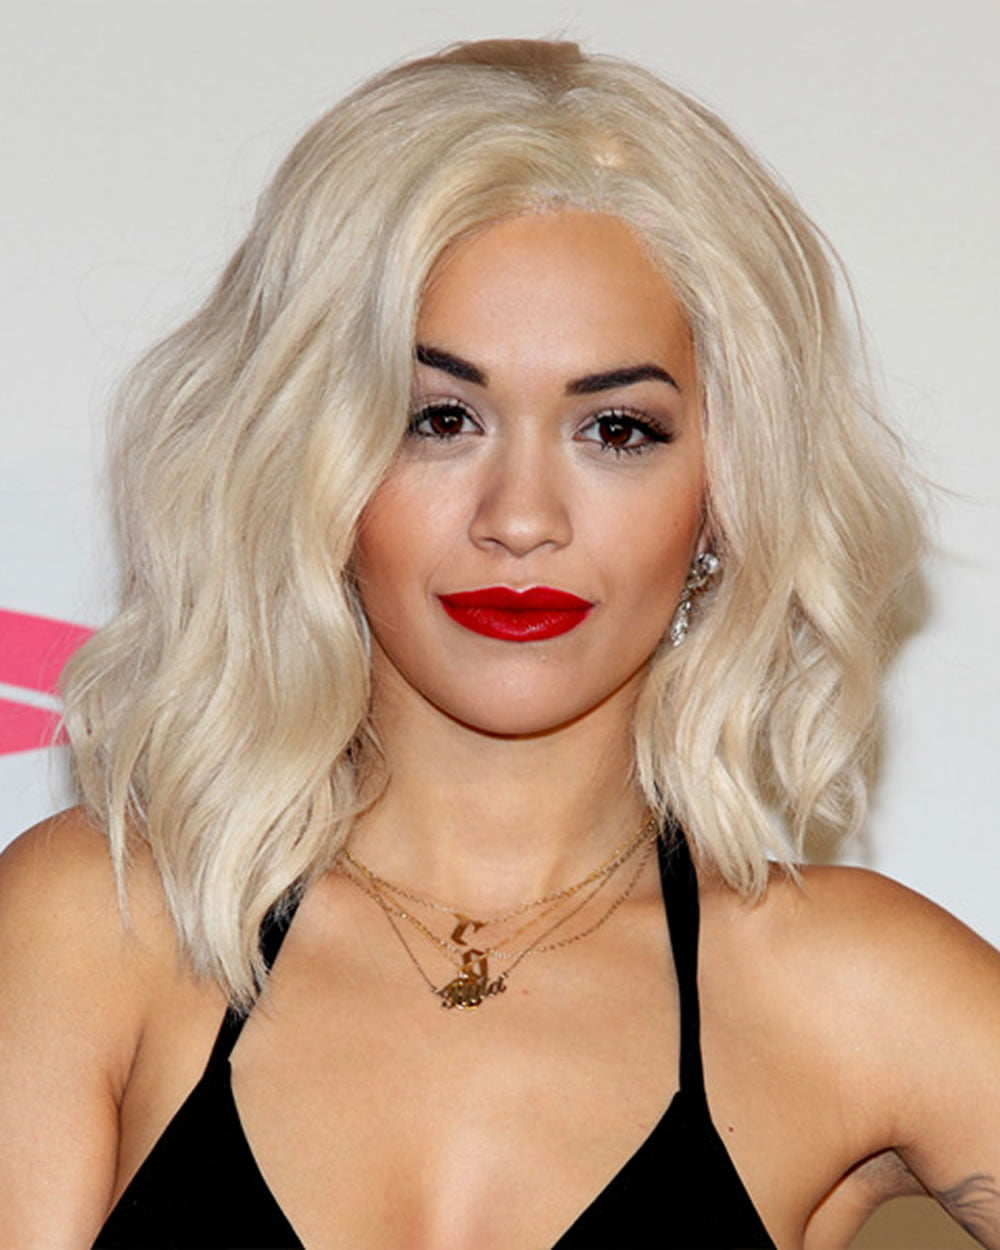 Rita Ora's Short Hairstyles (Pixie + Bob) for 2018 ...